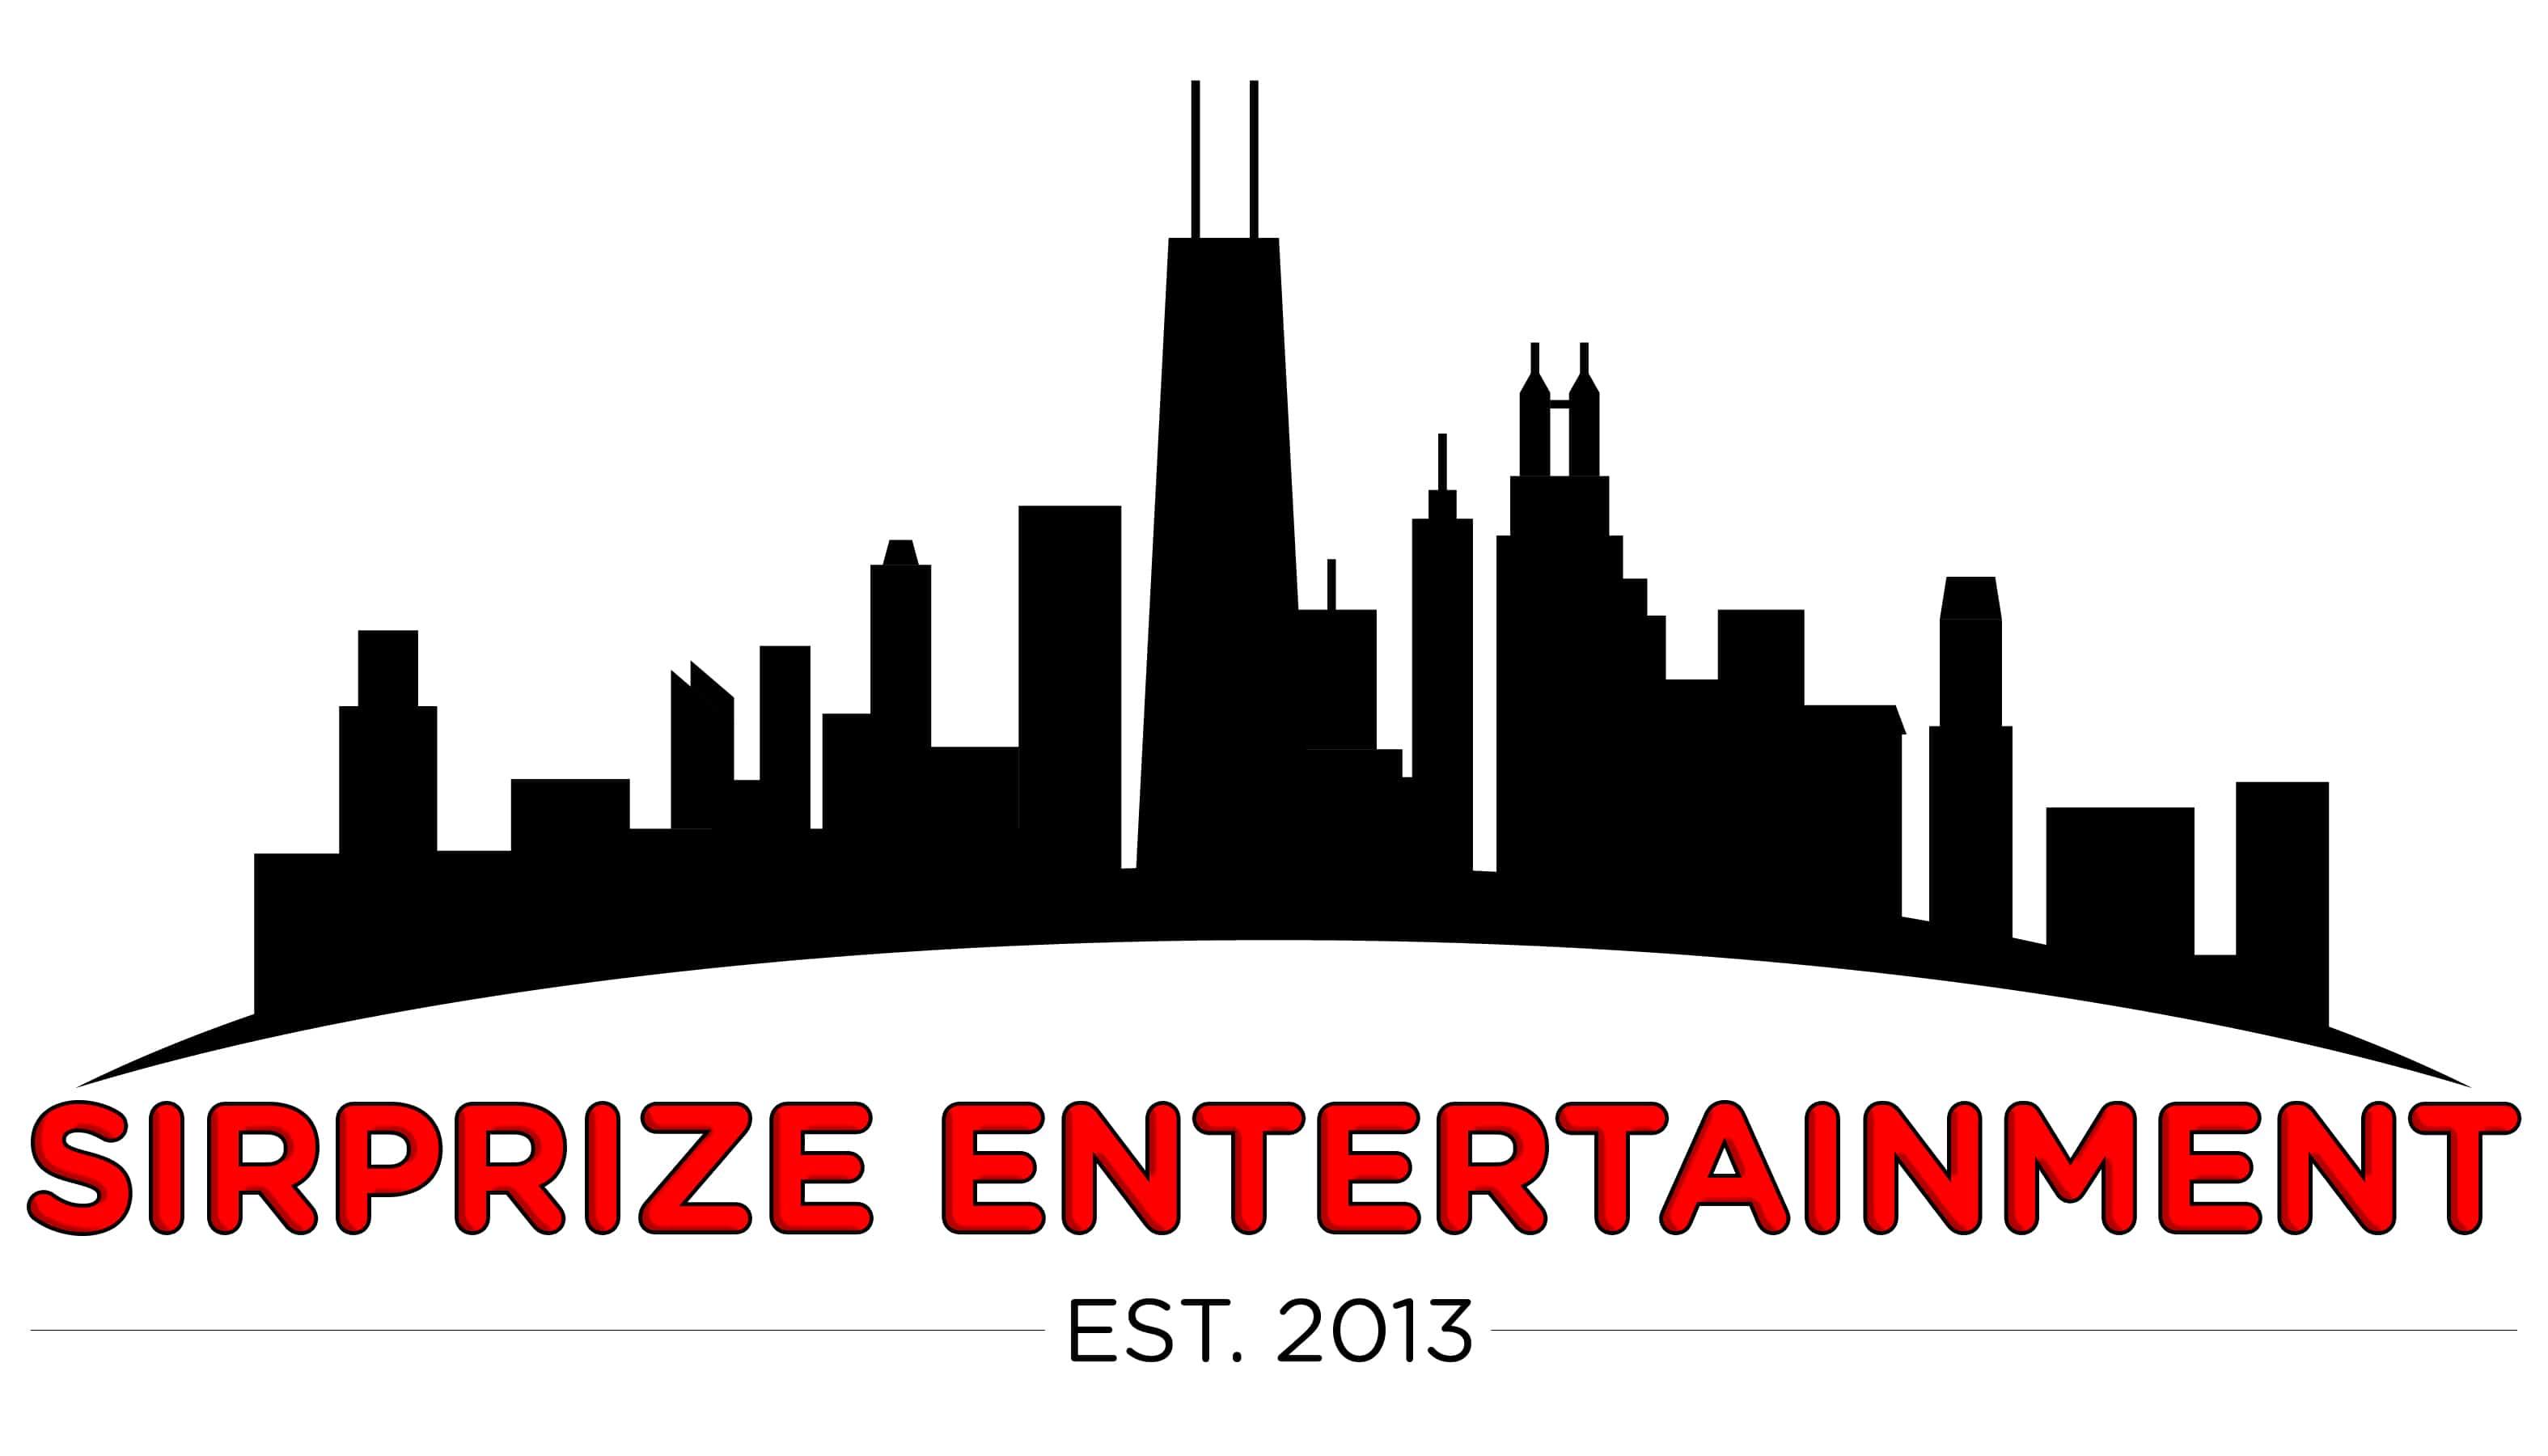 Sirprize-Entertainment